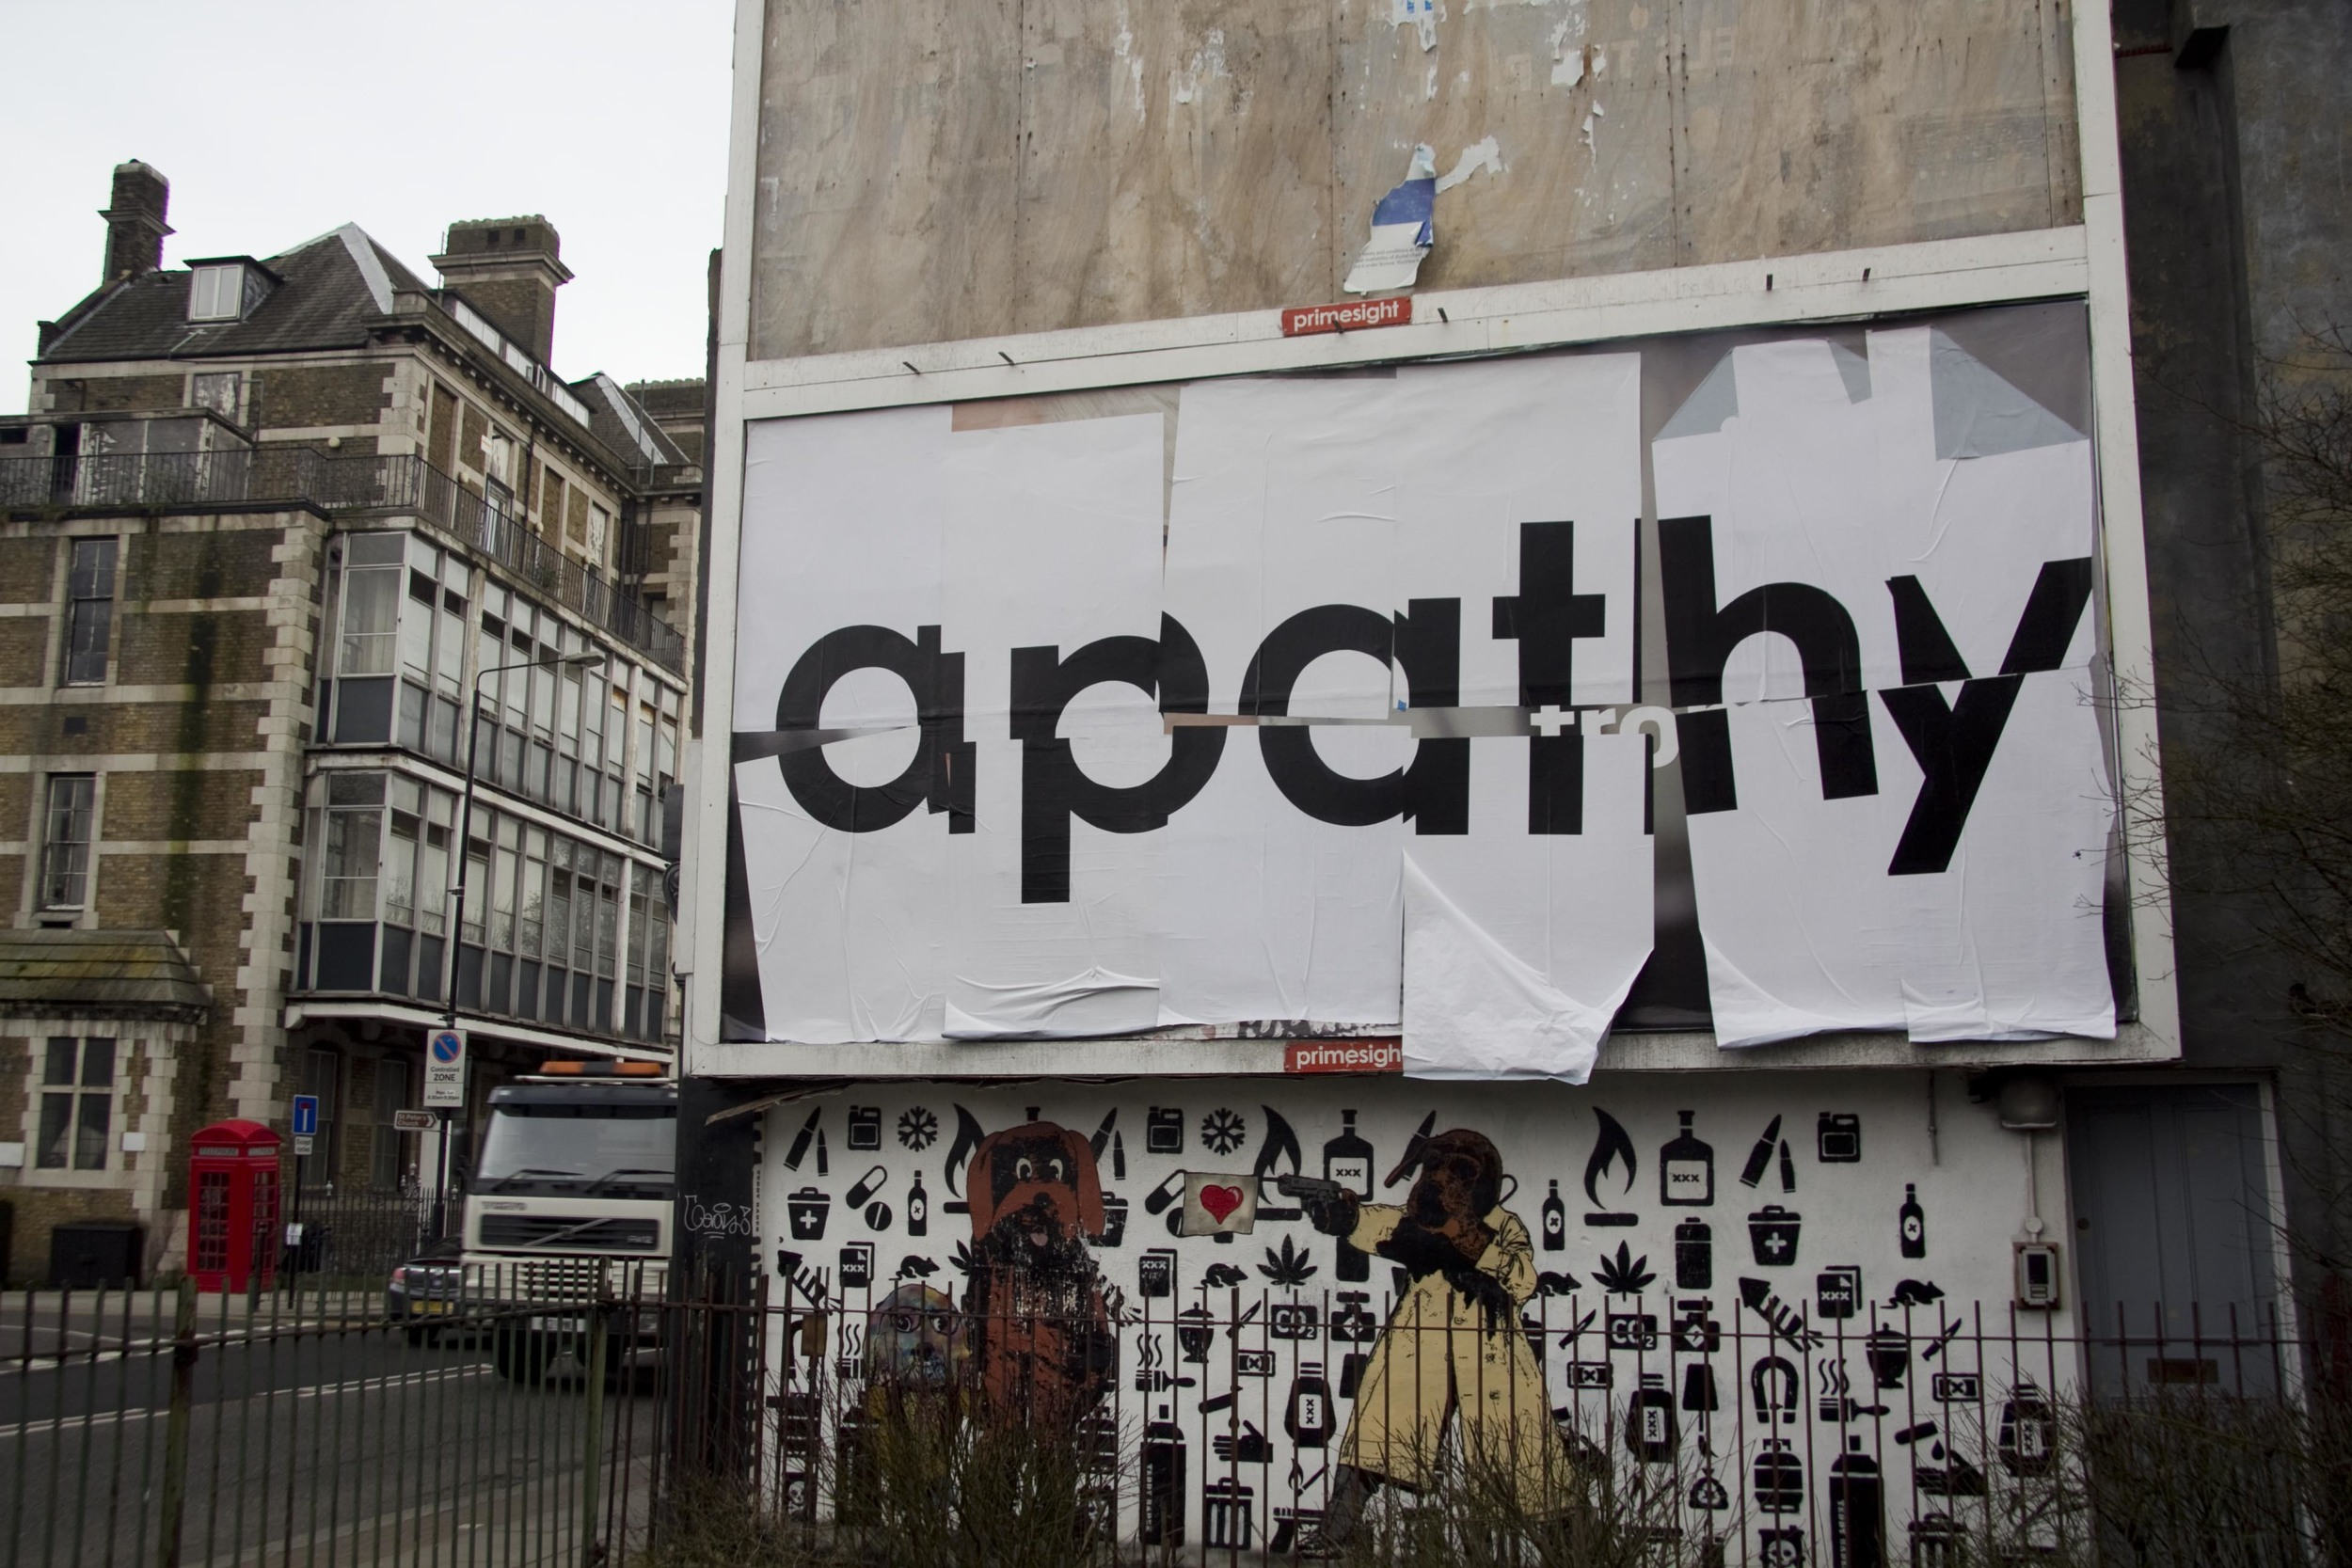 apathy_1.JPG